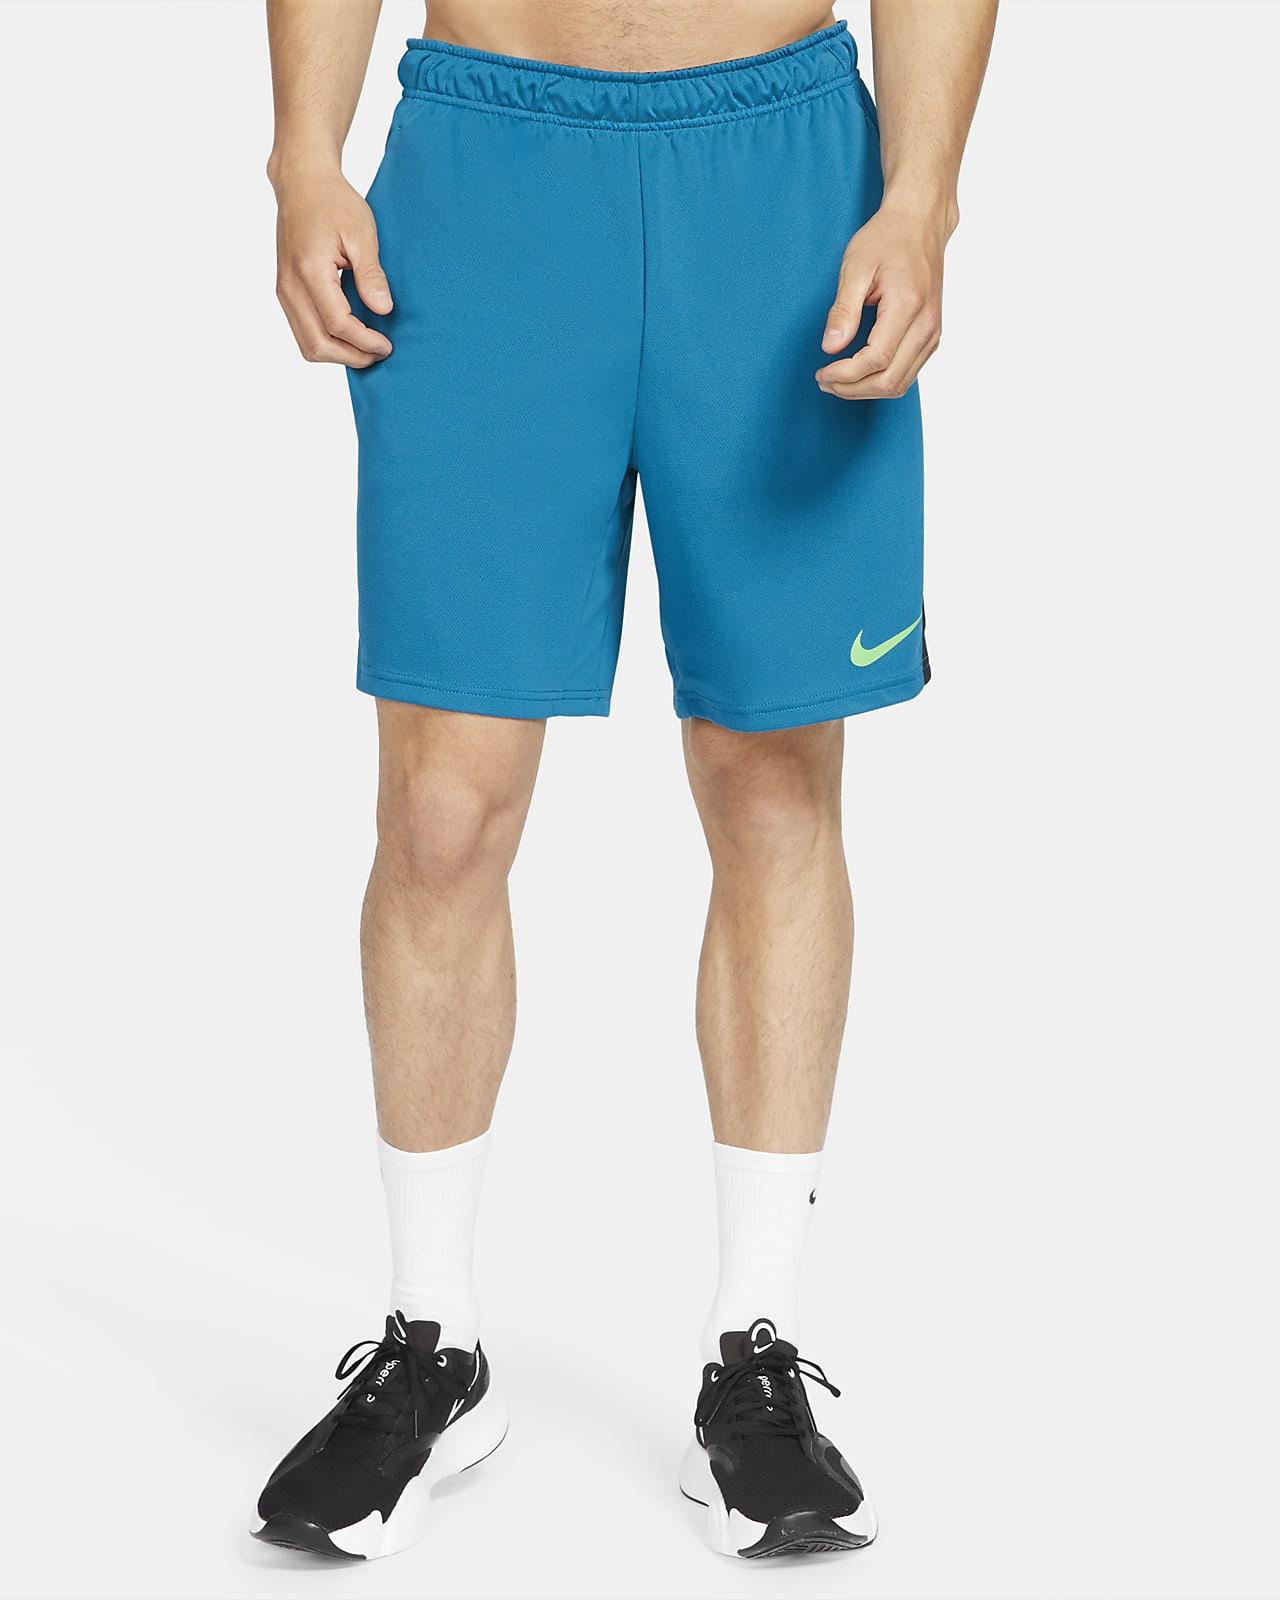 Мужские шорты для тренинга Nike Dri-FIT